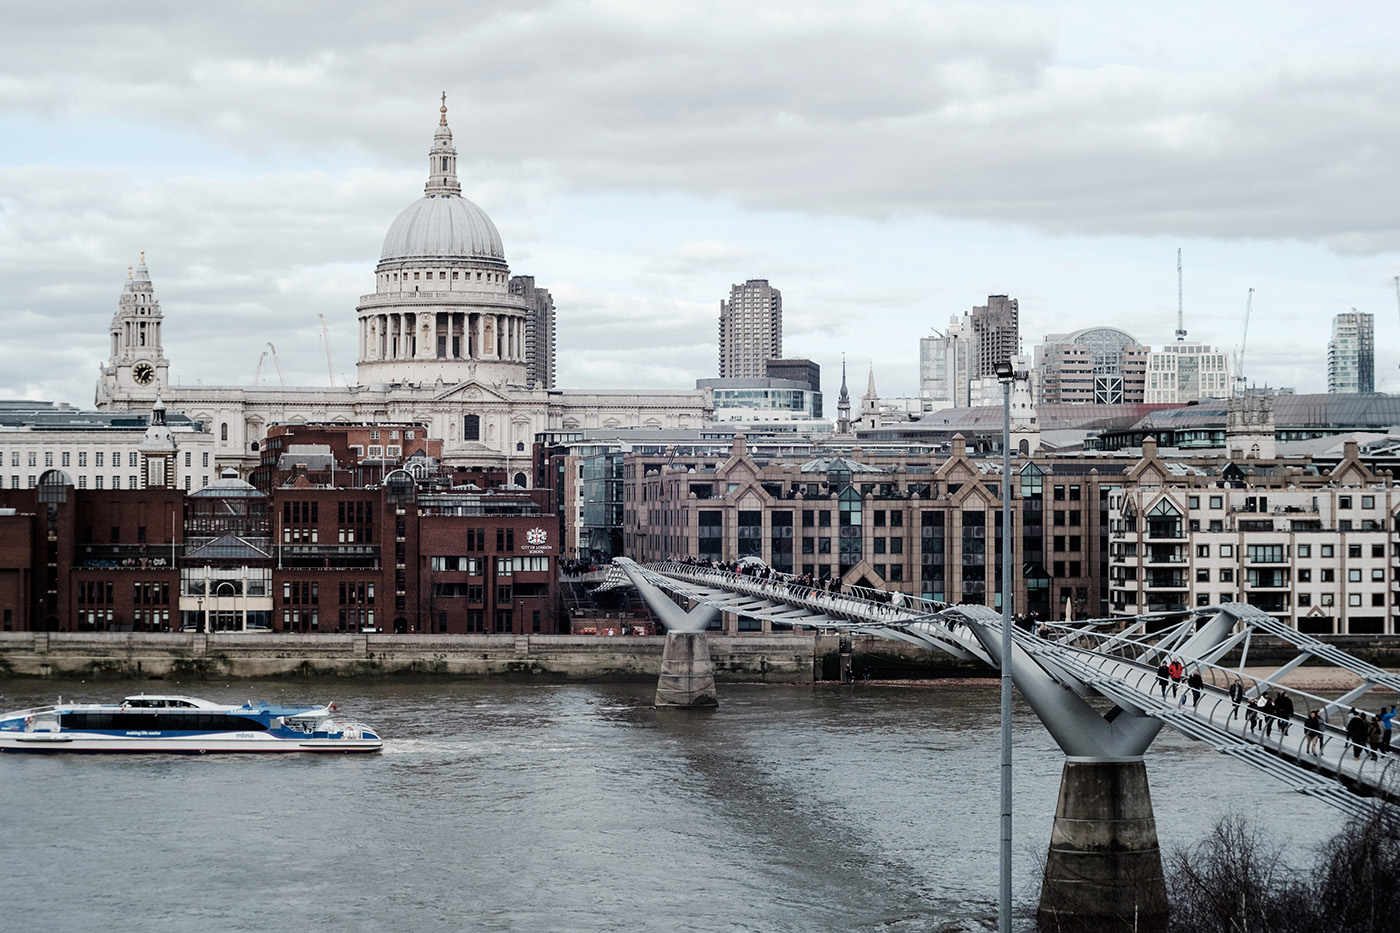 uberraum-london-city